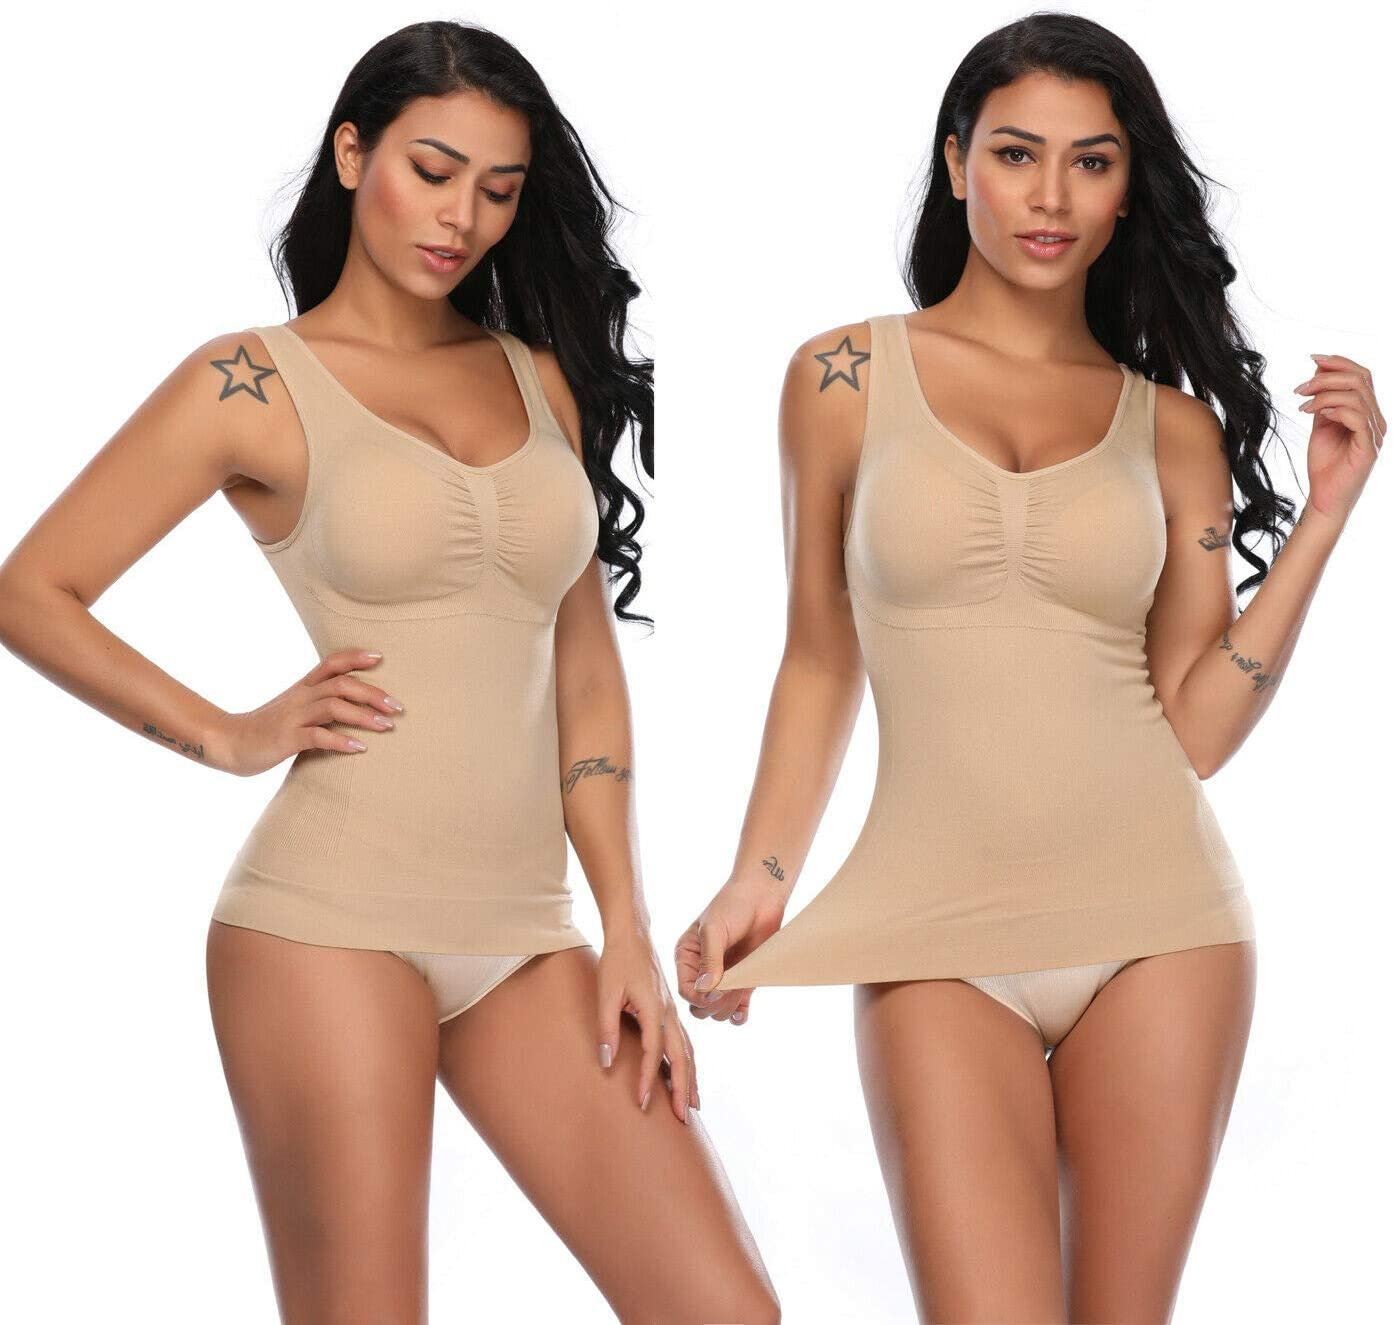 GGDK Garment Slimming Cami Shaper,Womens Slimming Body Shaper Tummy Control Shapewear Vest Cami Top